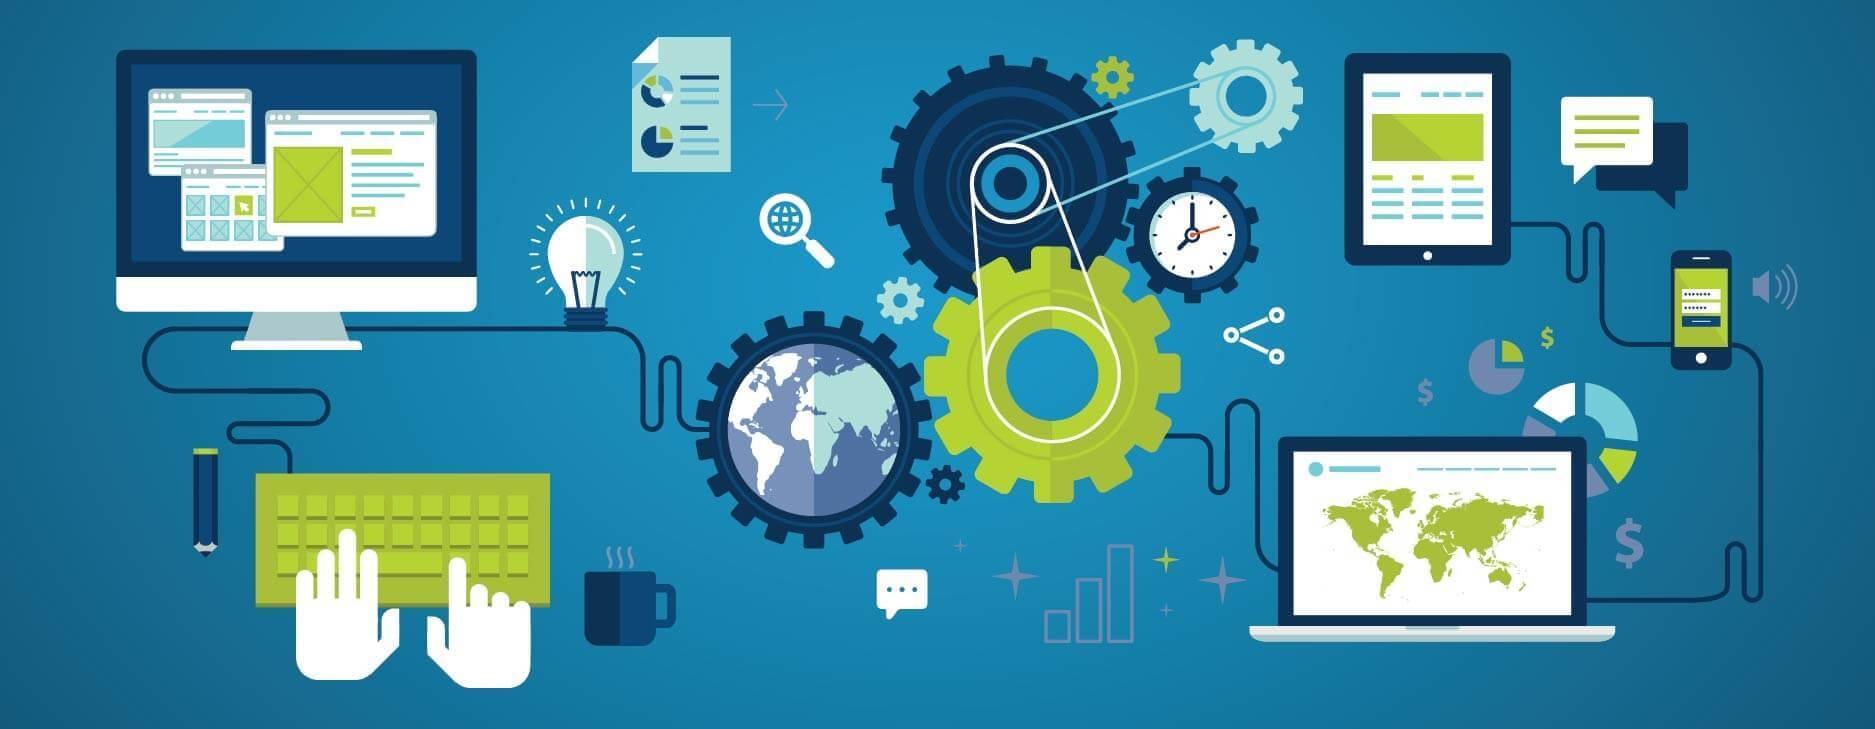 phần mềm email marketing trực tuyến